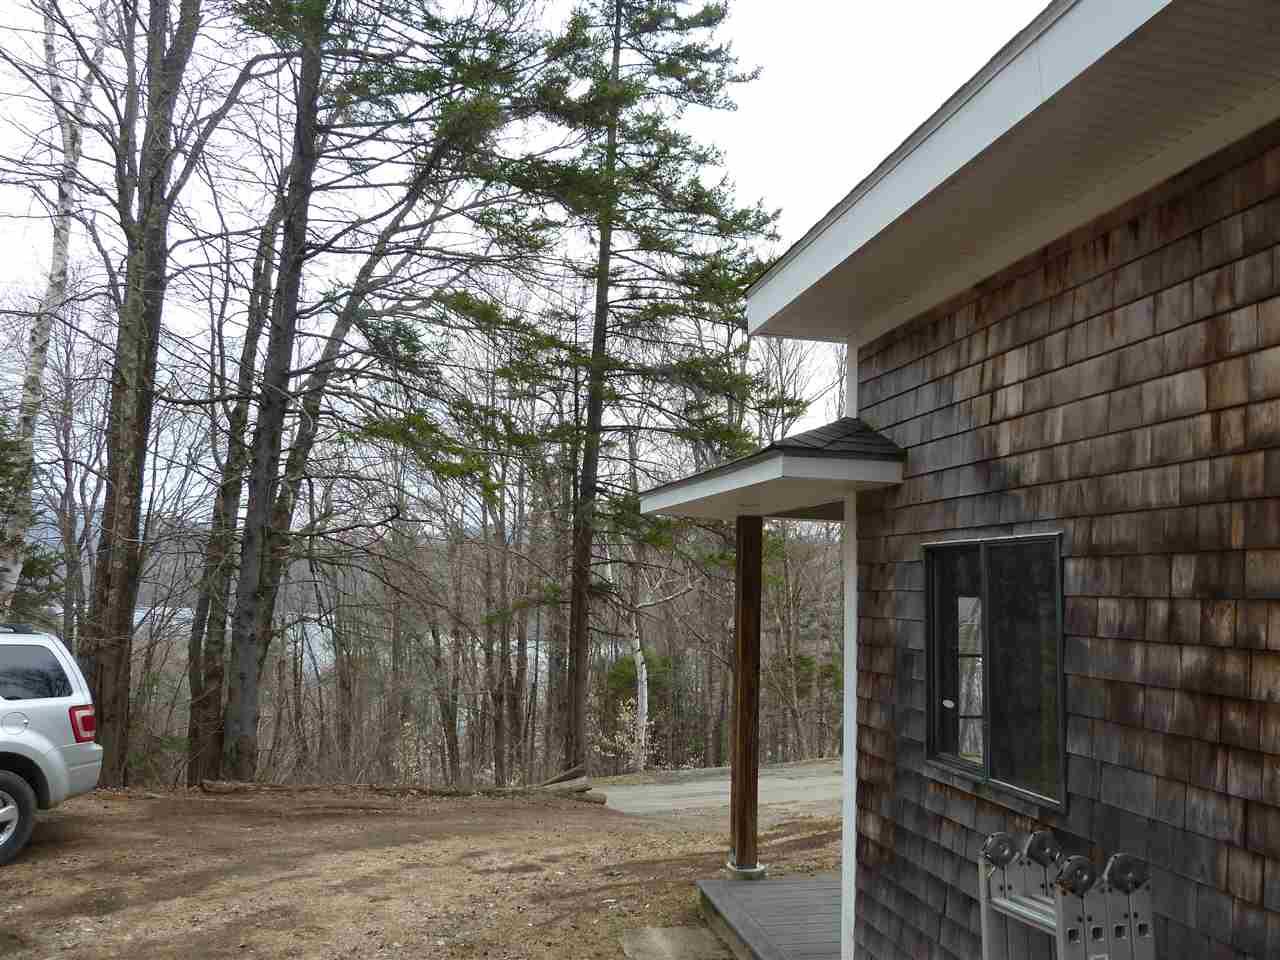 Mount-Snow-Real-Estate-4627390-14